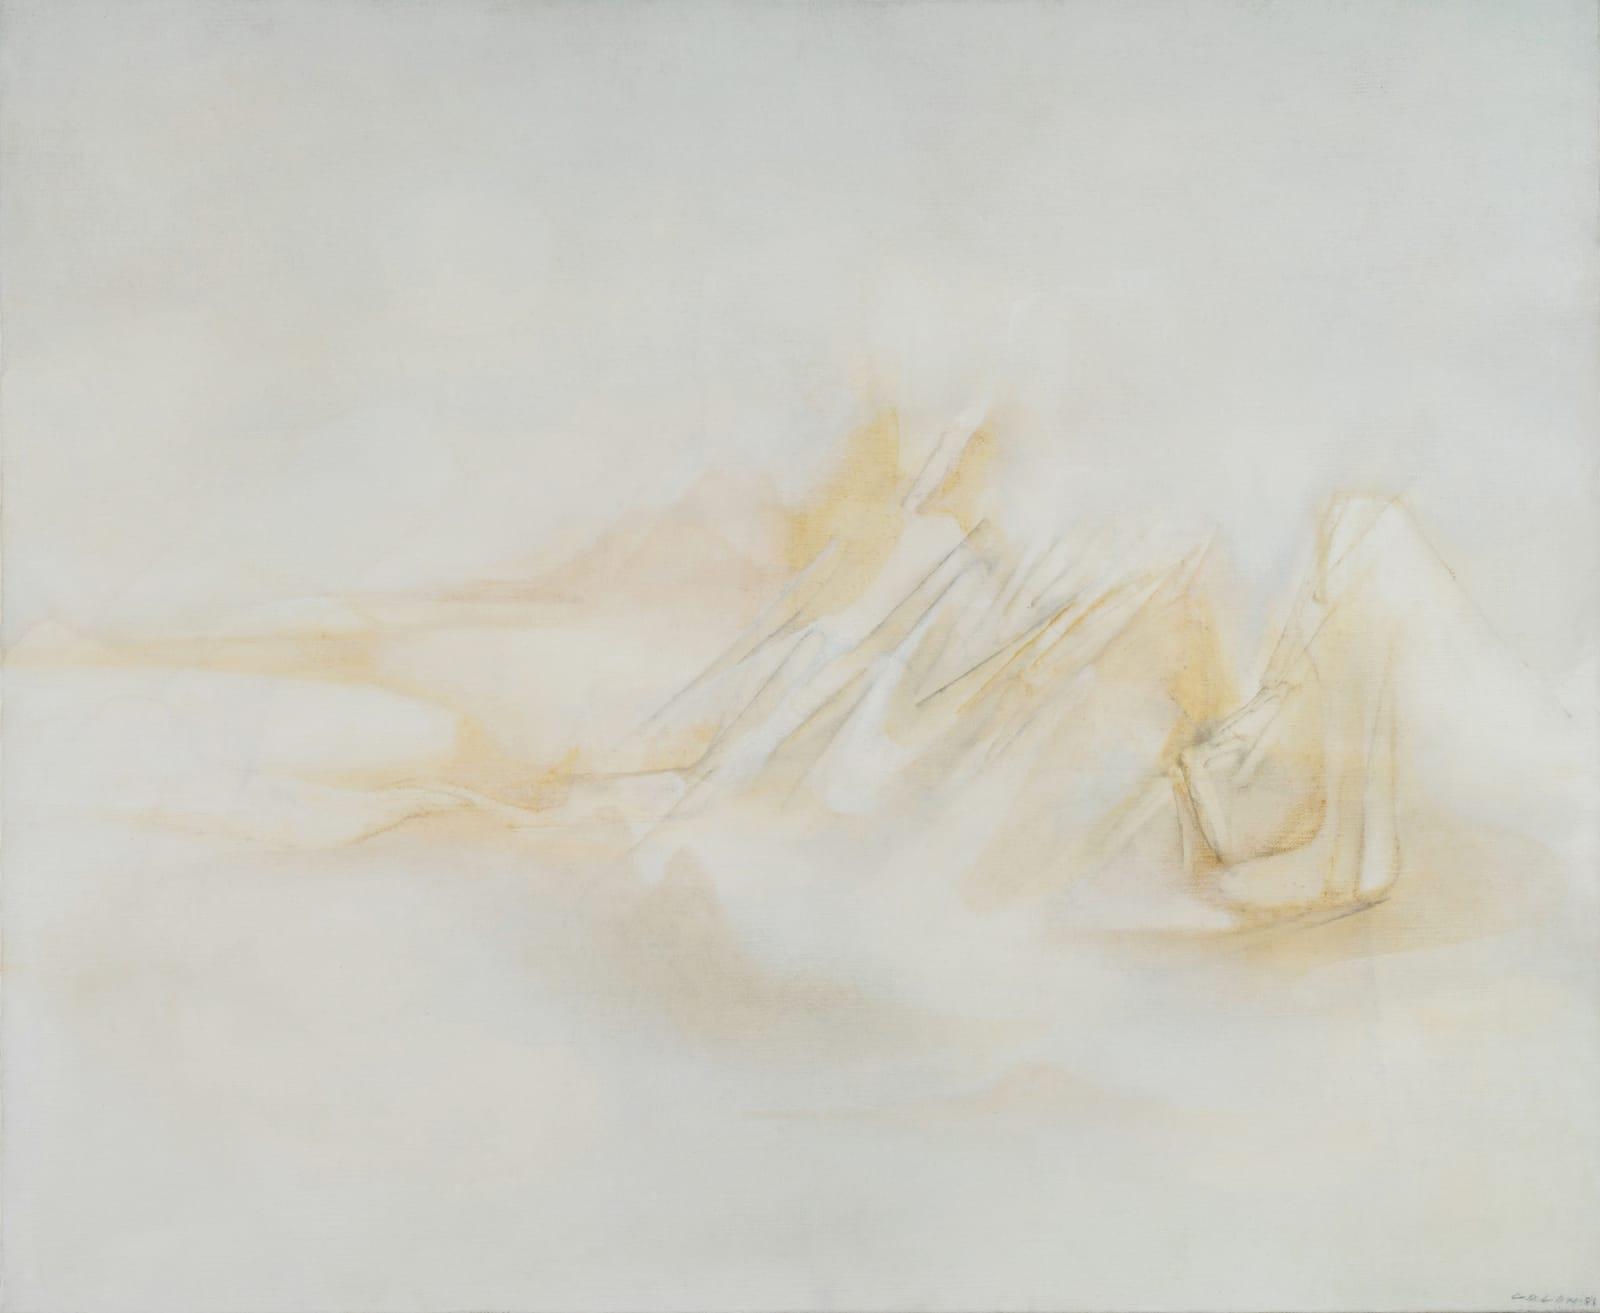 Lalan 謝景蘭, Vague Vision《模糊的視野》, 1981